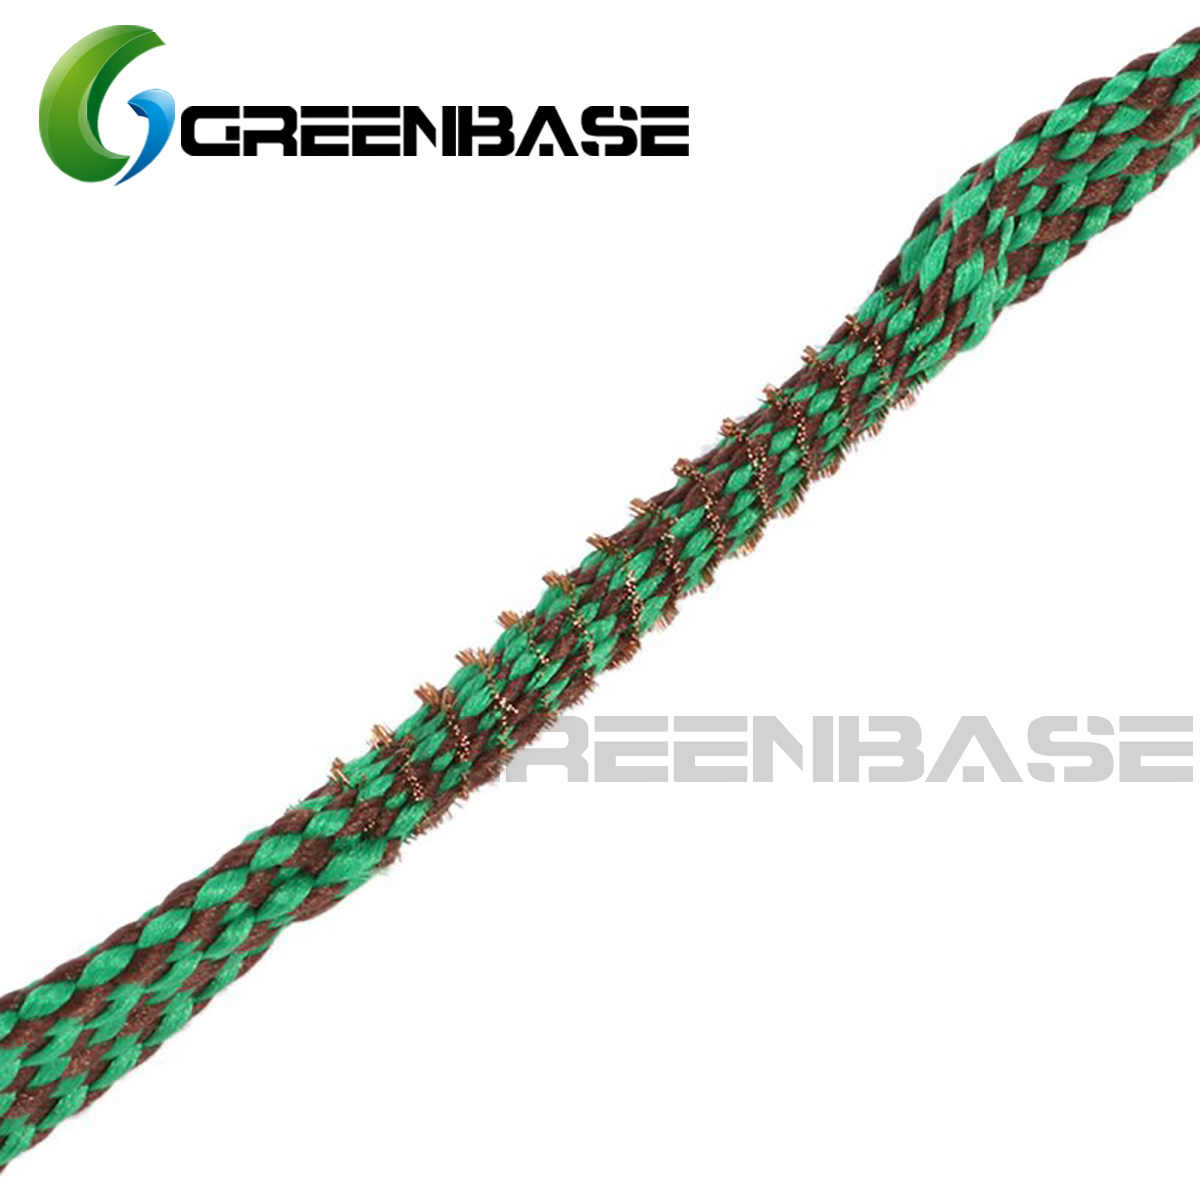 Greenbase 22 Cal 5.56mm Boring Slang Touw 223 Kaliber Pistool Rifle Cleaning Cord Kit Accessoires